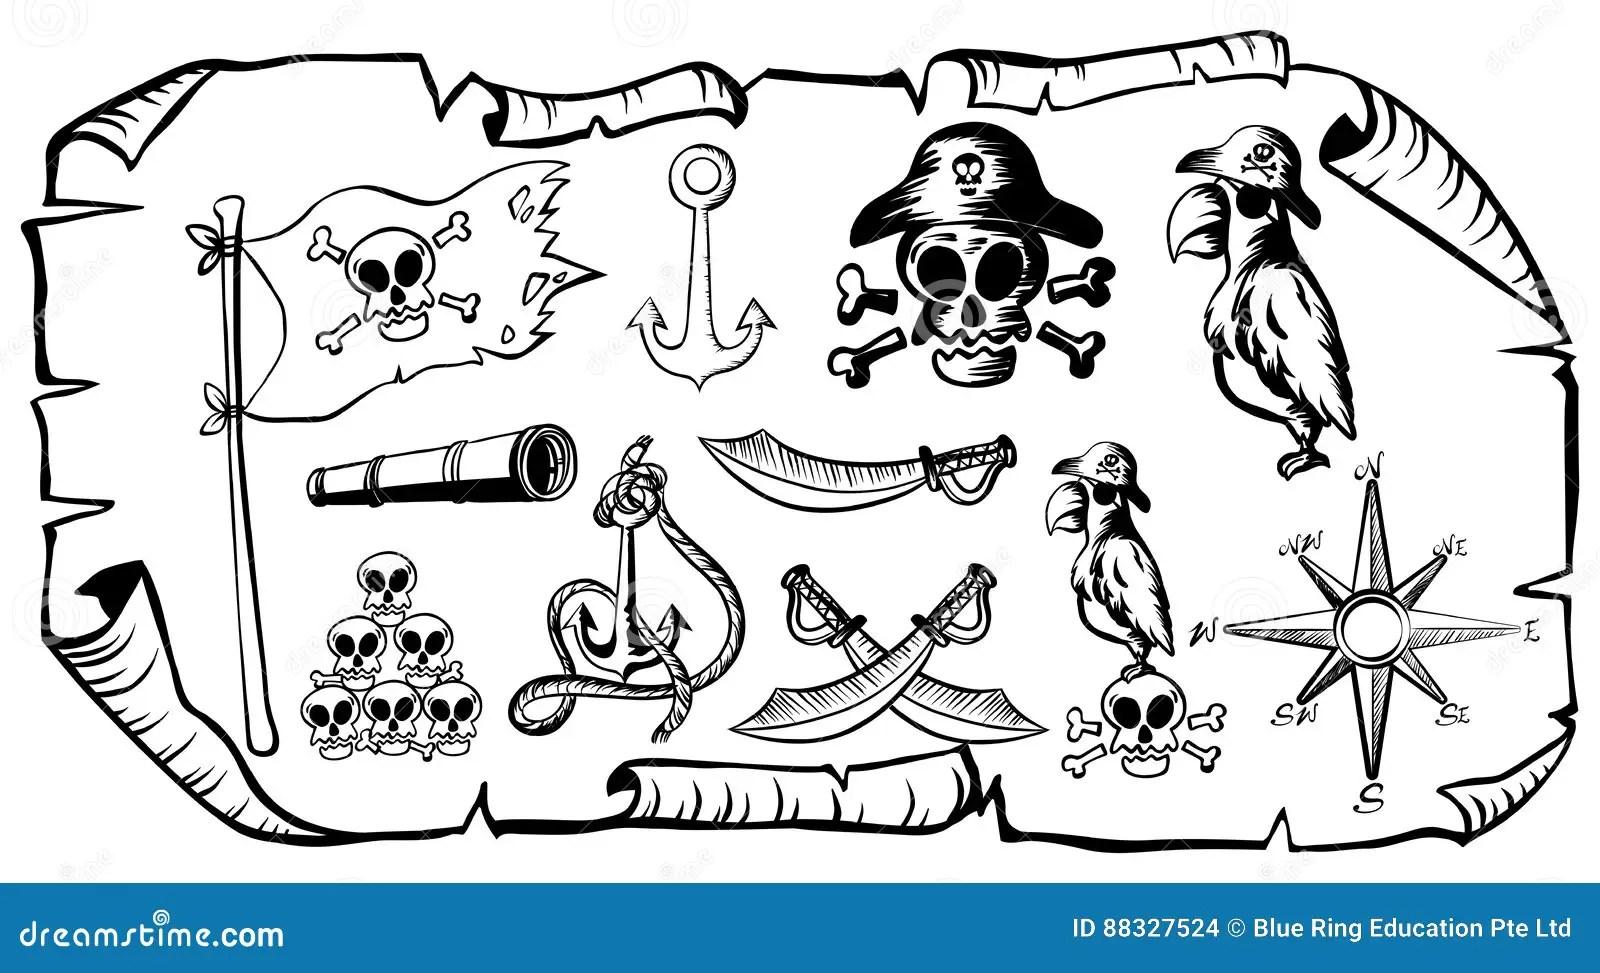 Treasure Map With Pirate Symbols Stock Vector